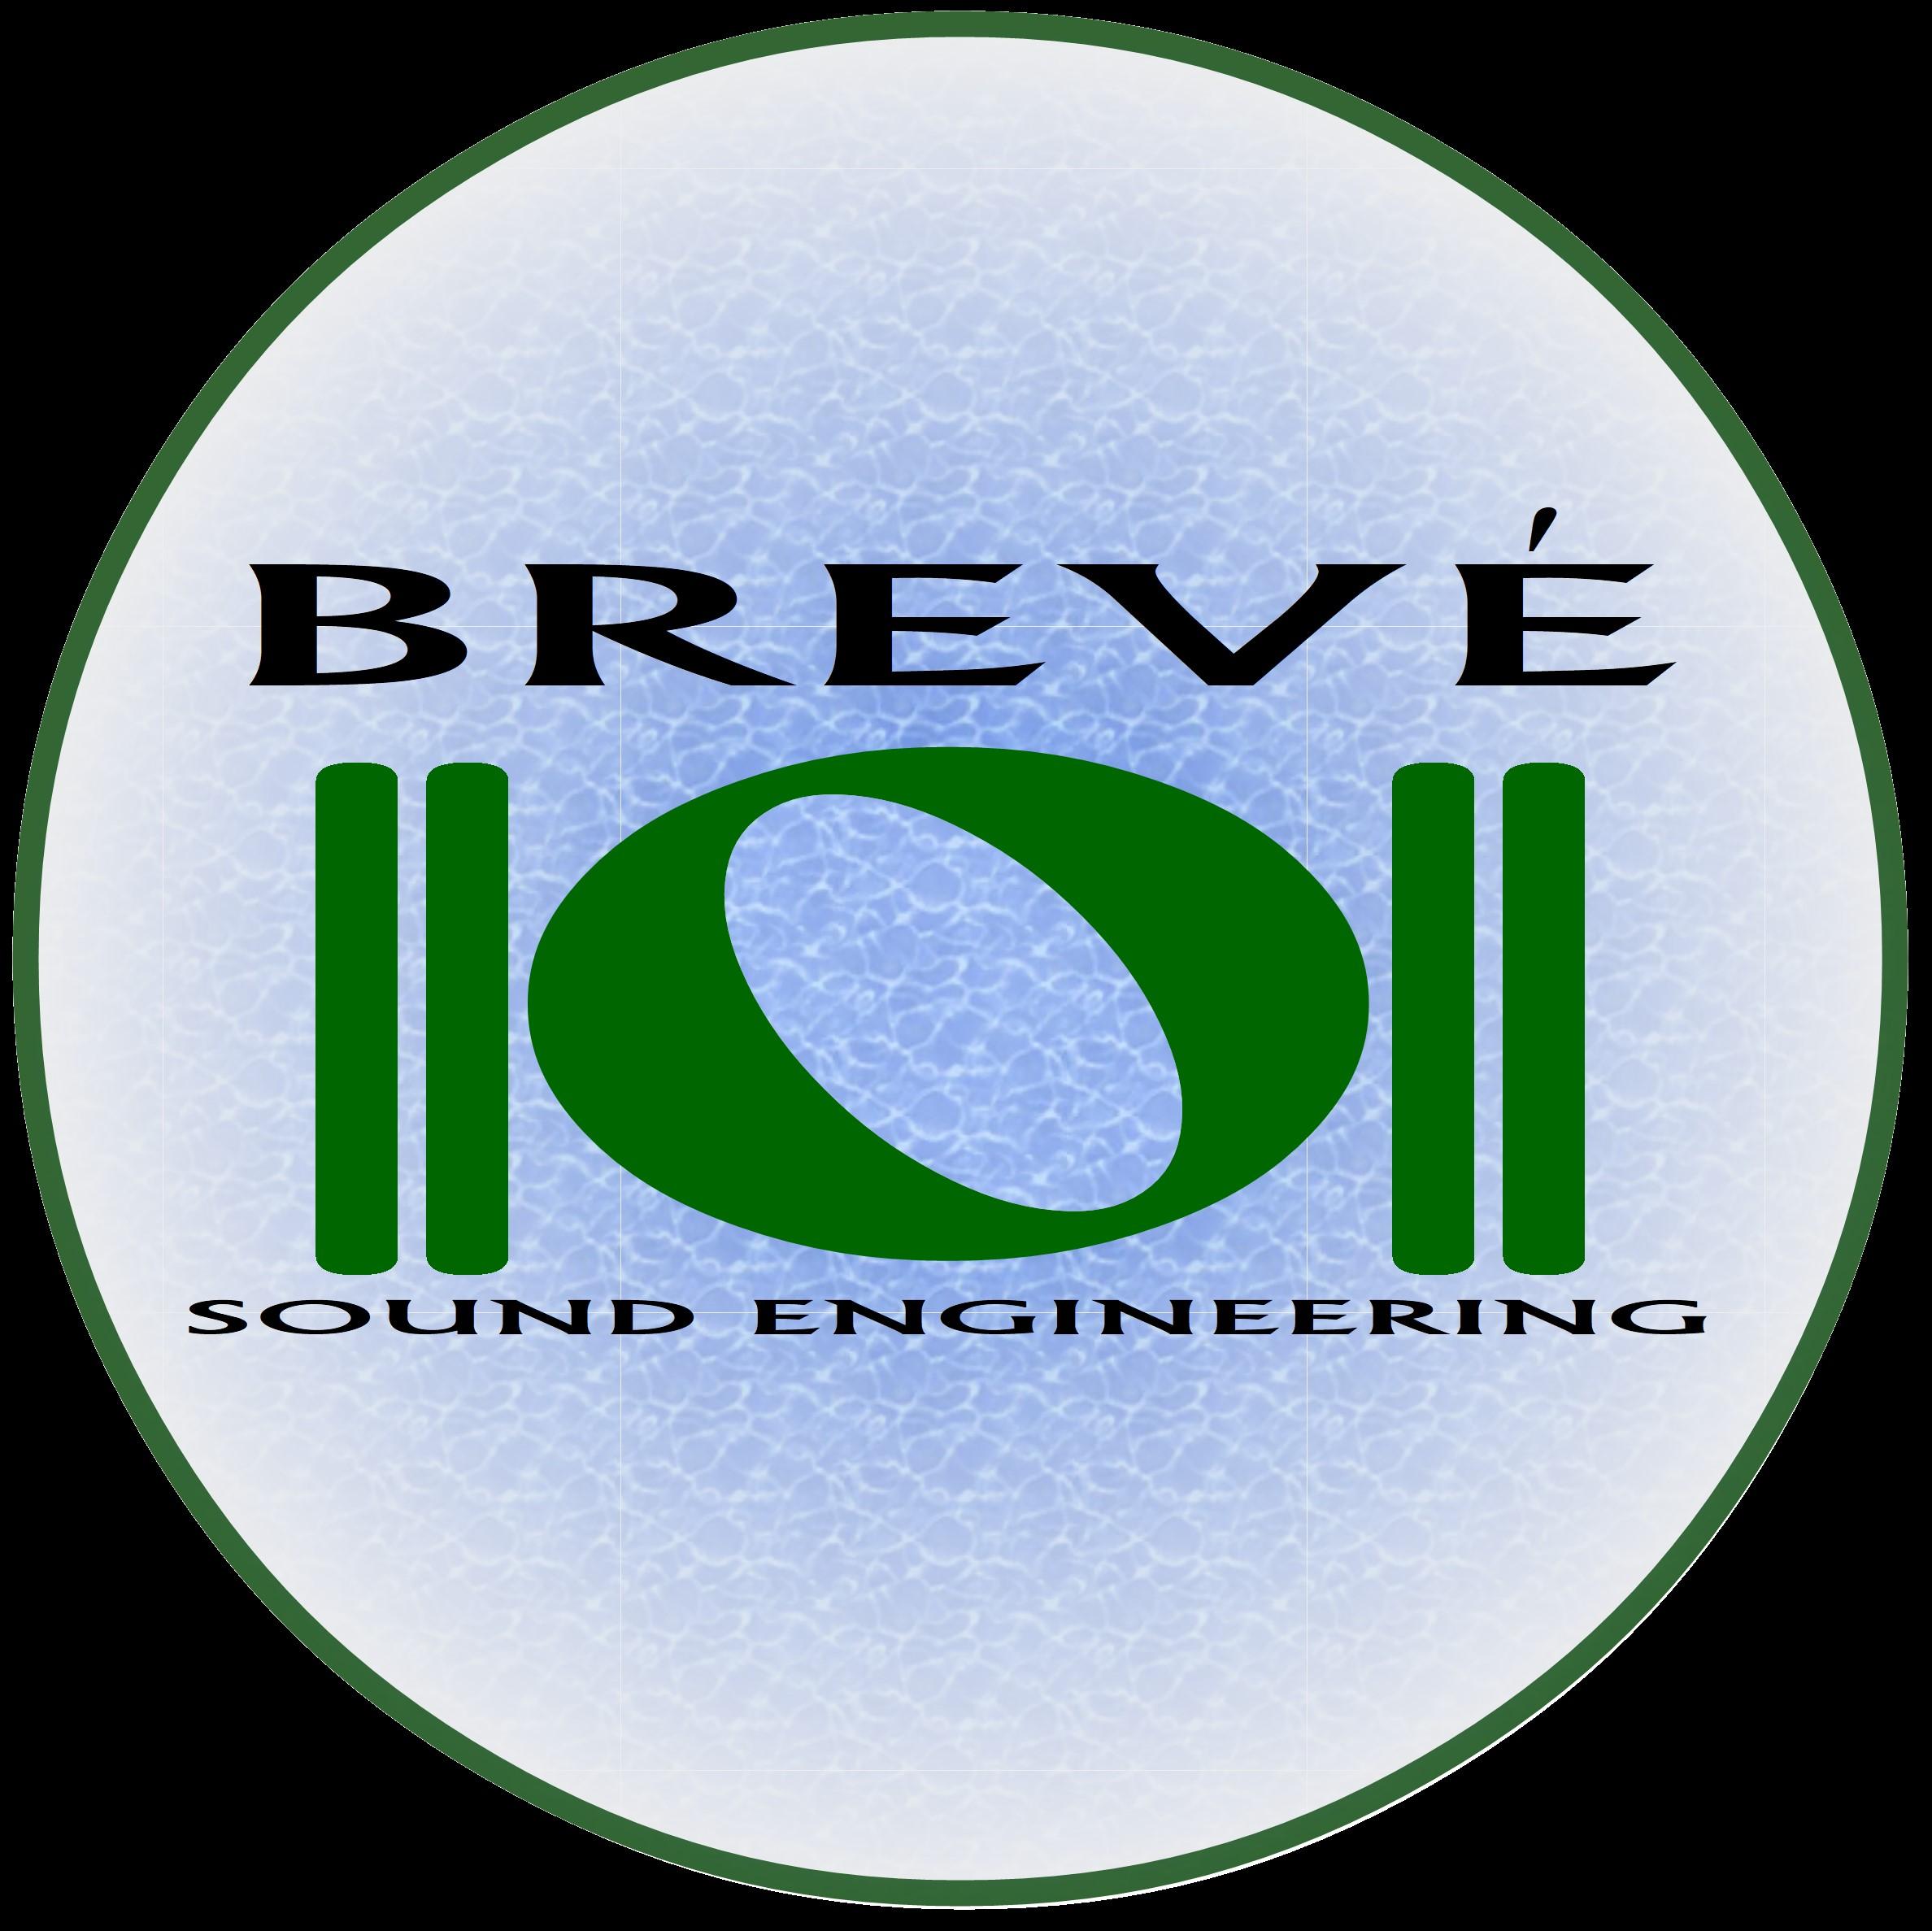 Breve Sound